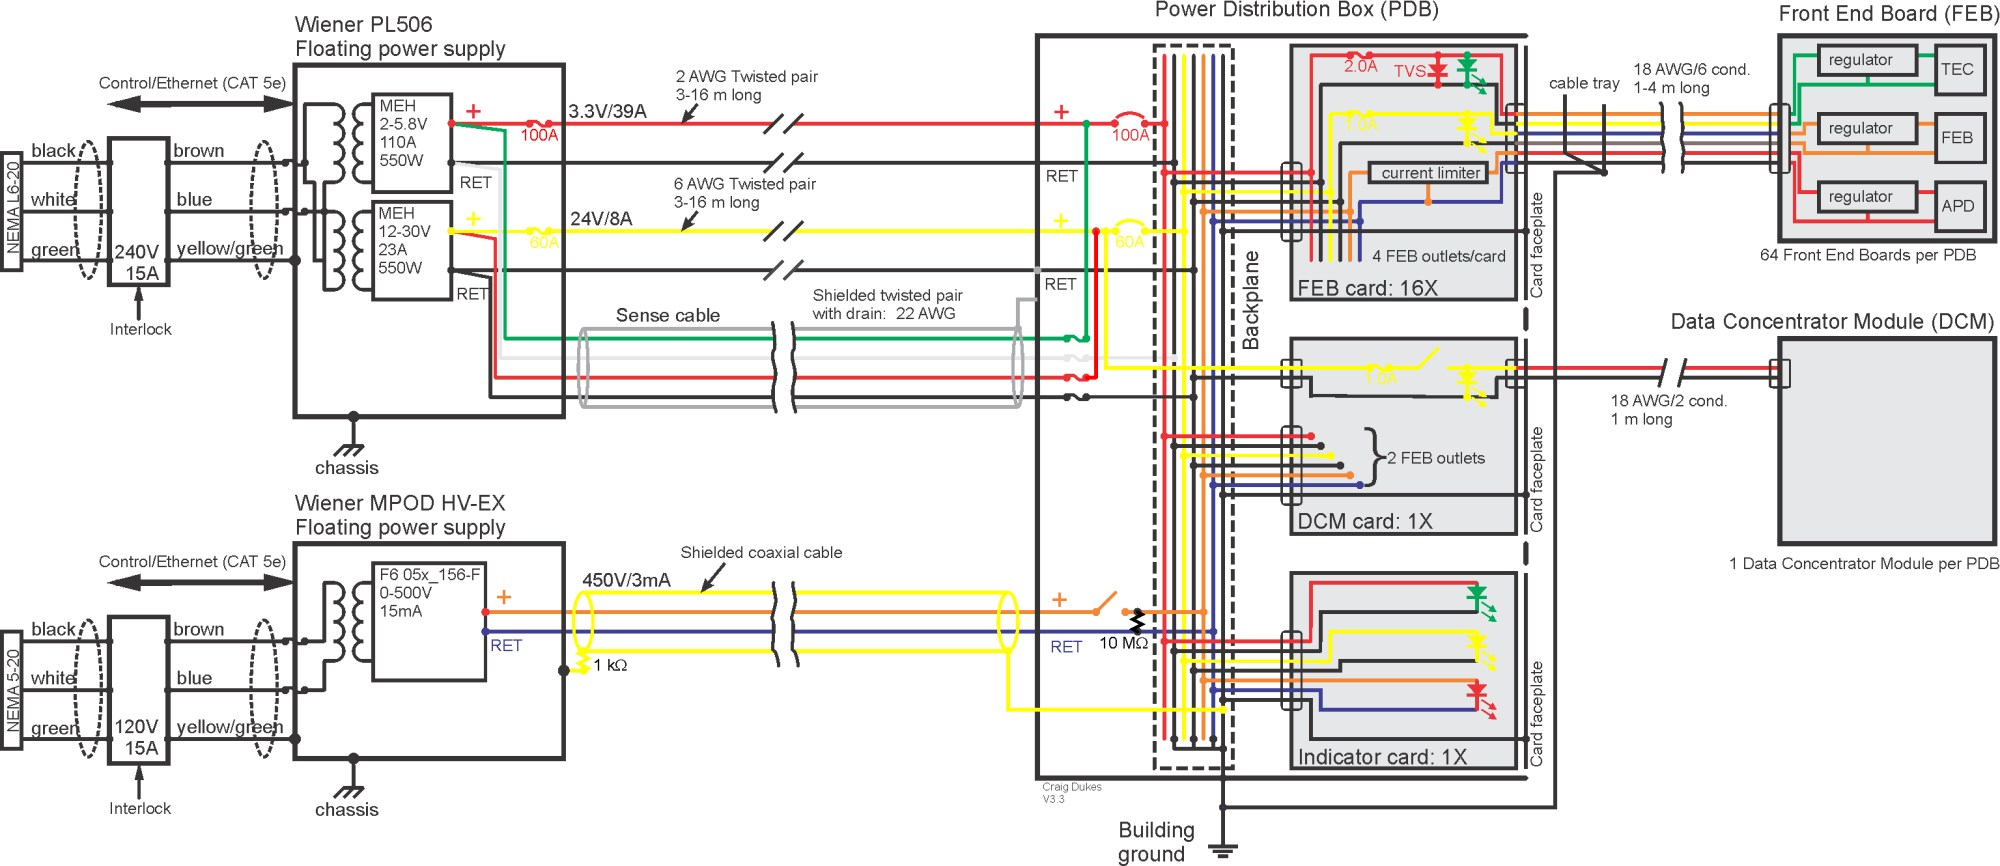 hight resolution of circuit breaker panel wiring diagram pdf